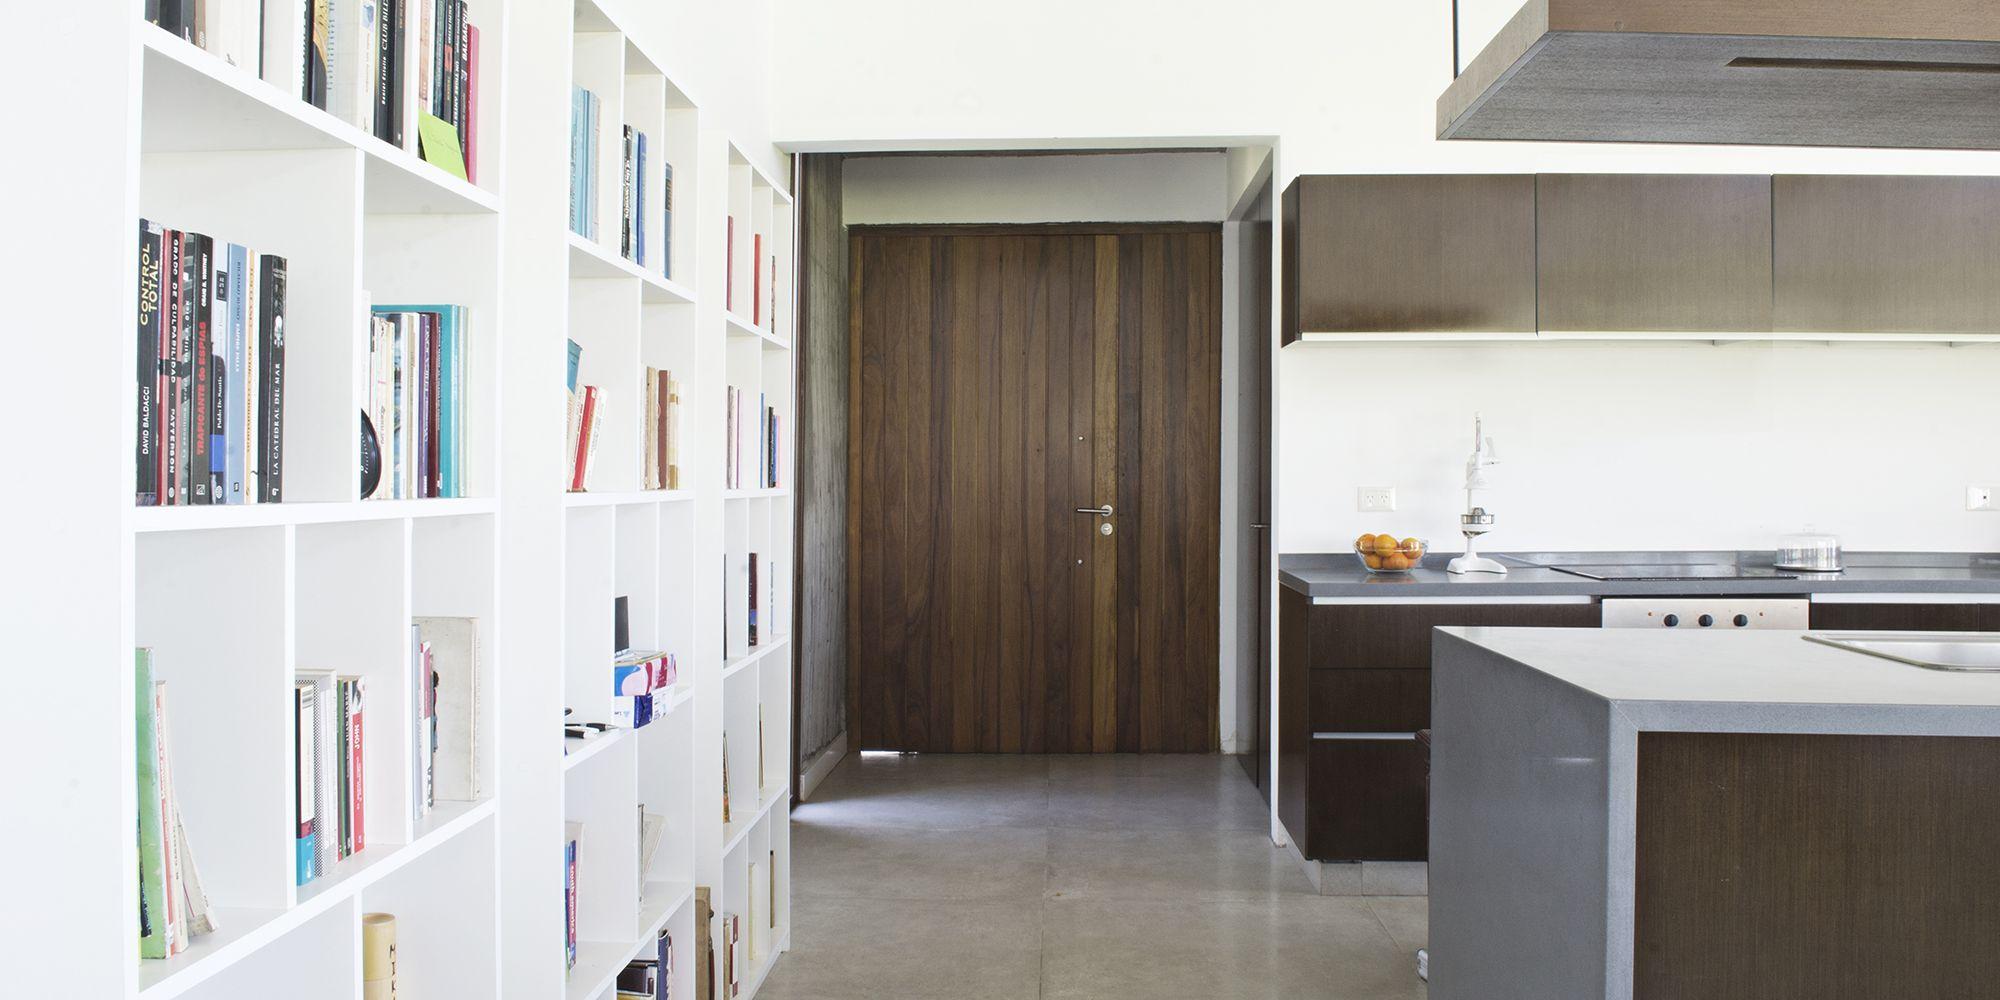 Casa CL: Cocina moderna con barra integrada al living-comedor